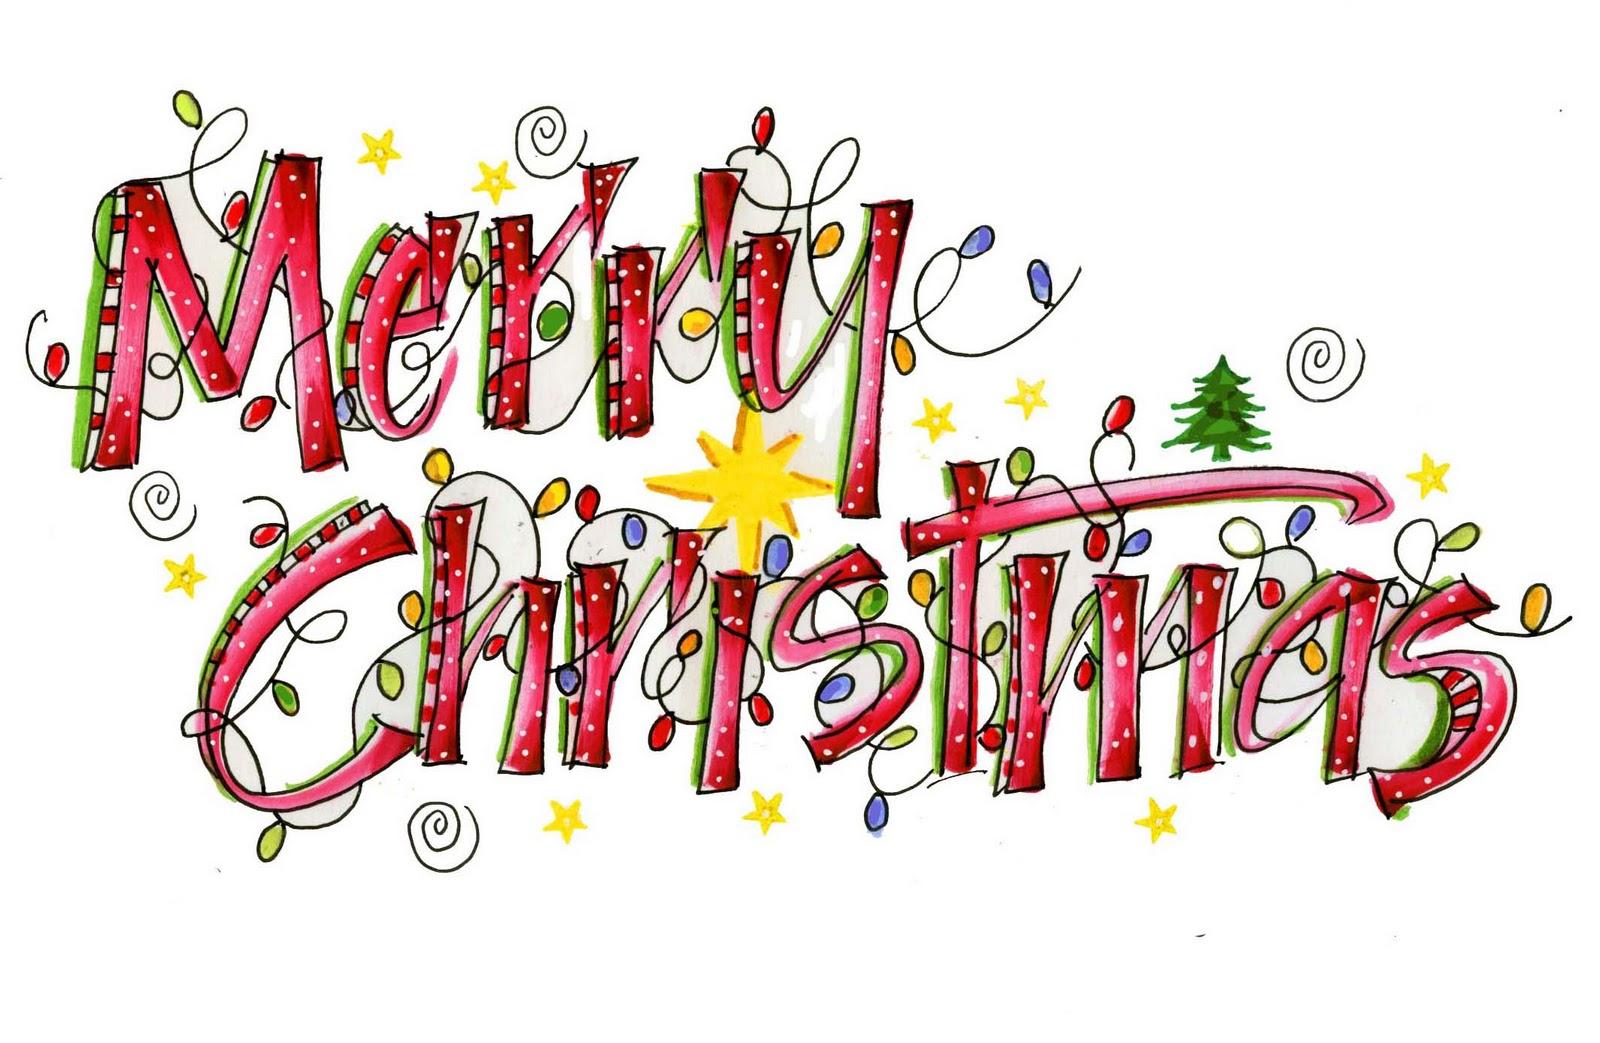 Merry Christmas Everyone Steve Tierney S-Merry Christmas Everyone Steve Tierney S Blog-13